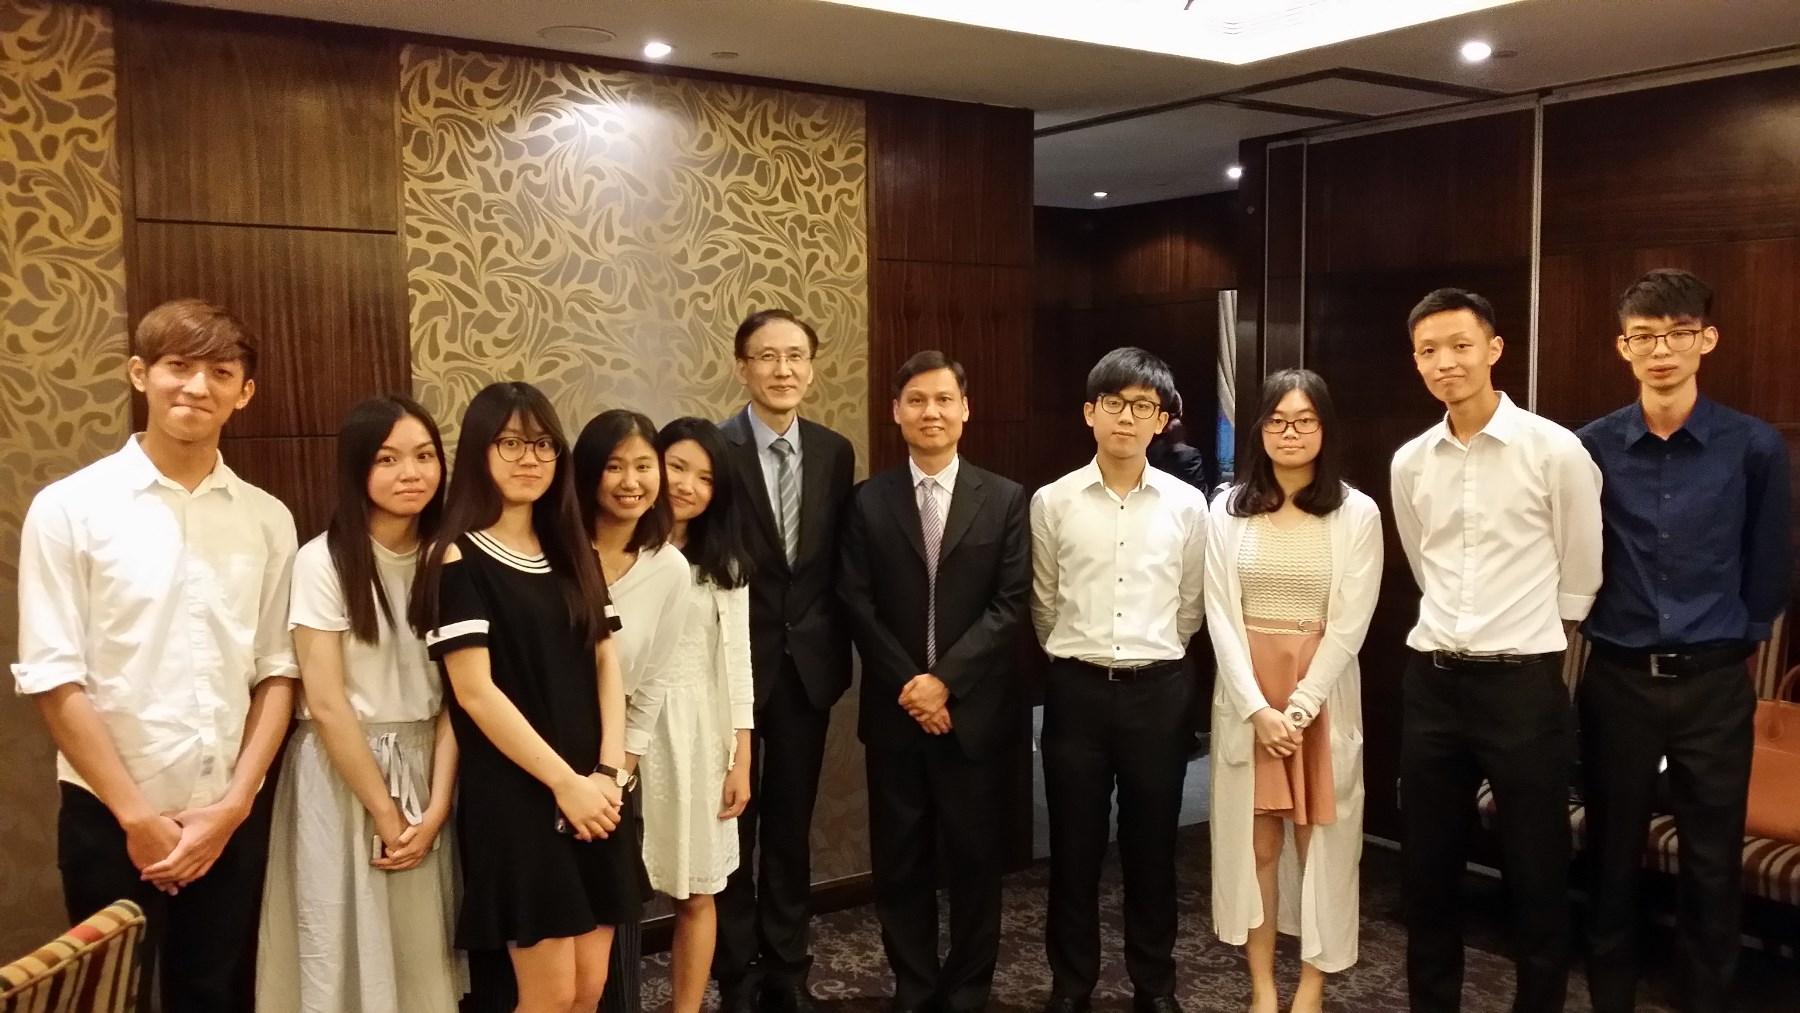 http://www.npc.edu.hk/sites/default/files/20170622_211542.jpg